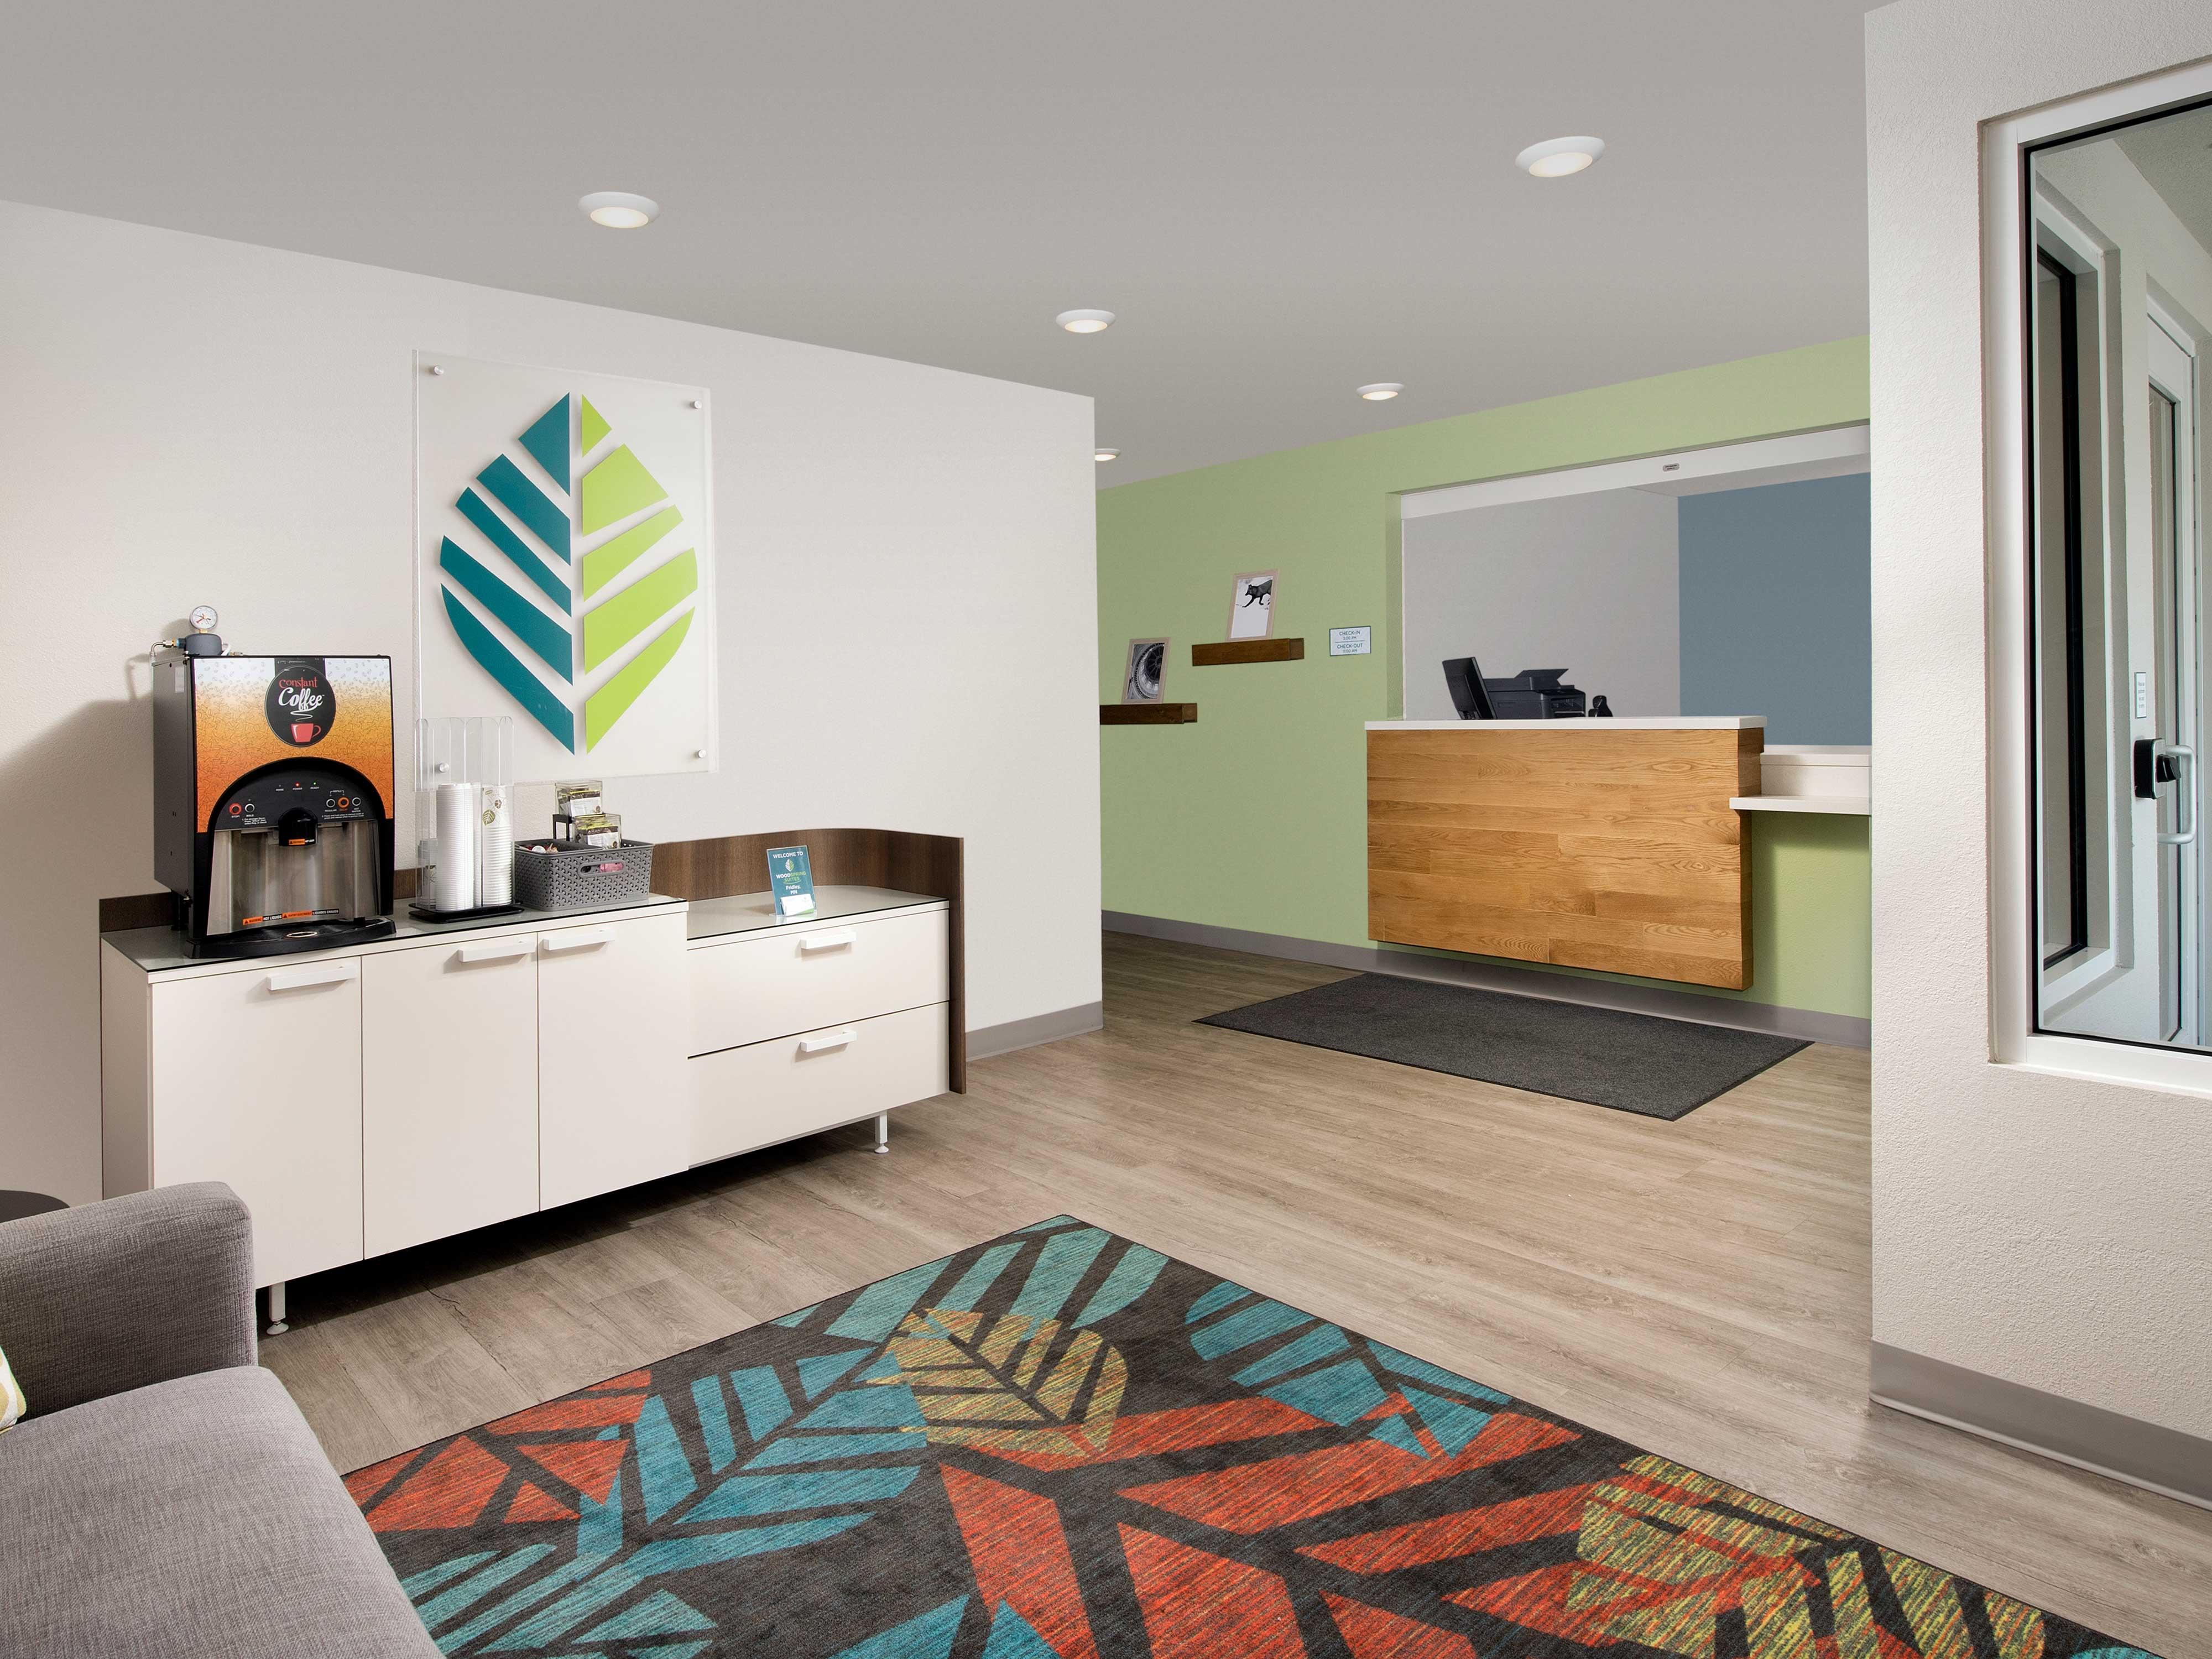 WoodSpring Suites Minneapolis Fridley Fridley Minnesota MN  LocalDatabasecom